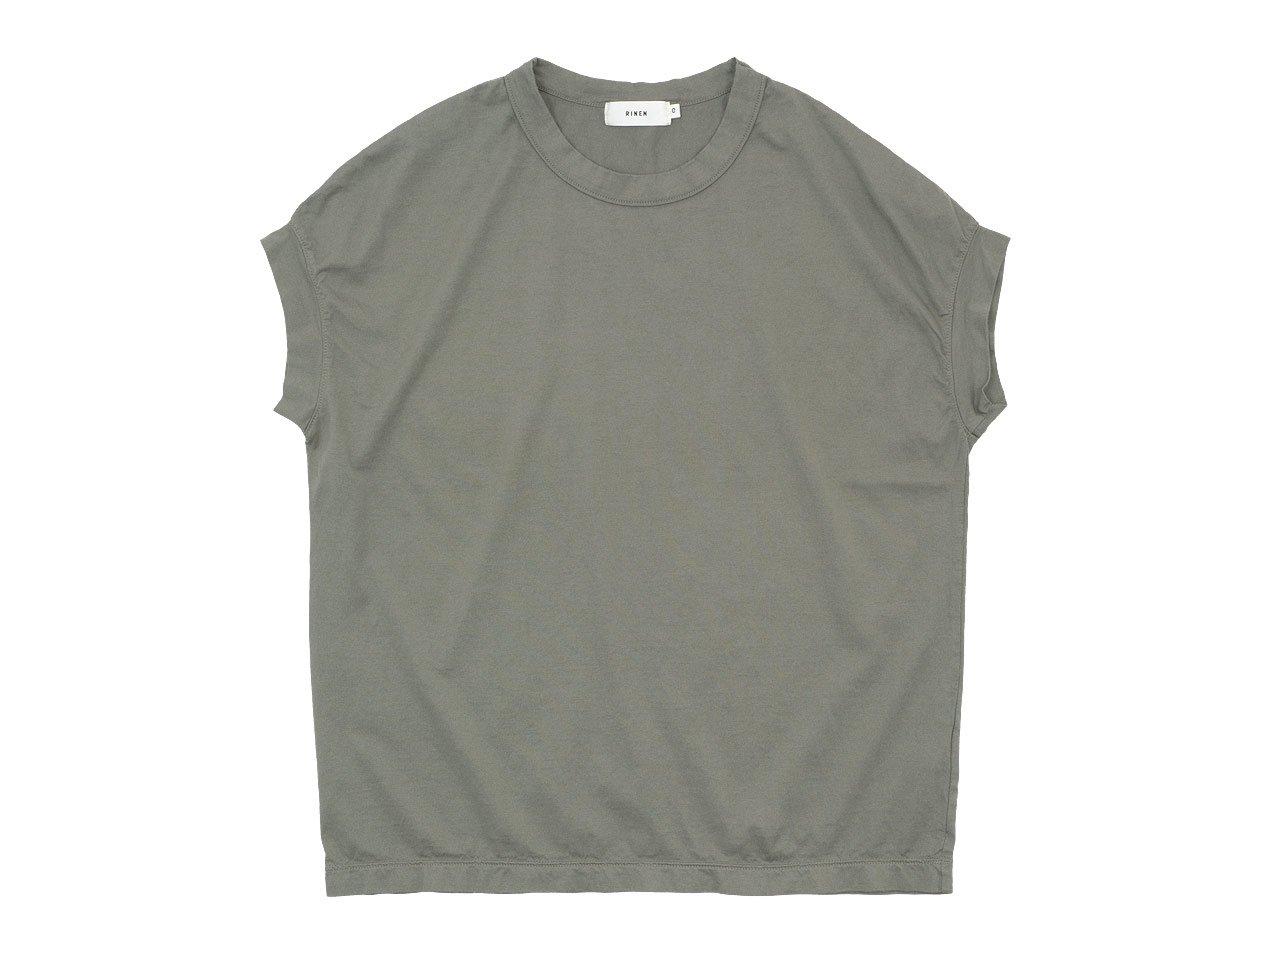 RINEN 60/2天竺 フレンチスリーブTシャツ 09オリーブ 〔レディース〕